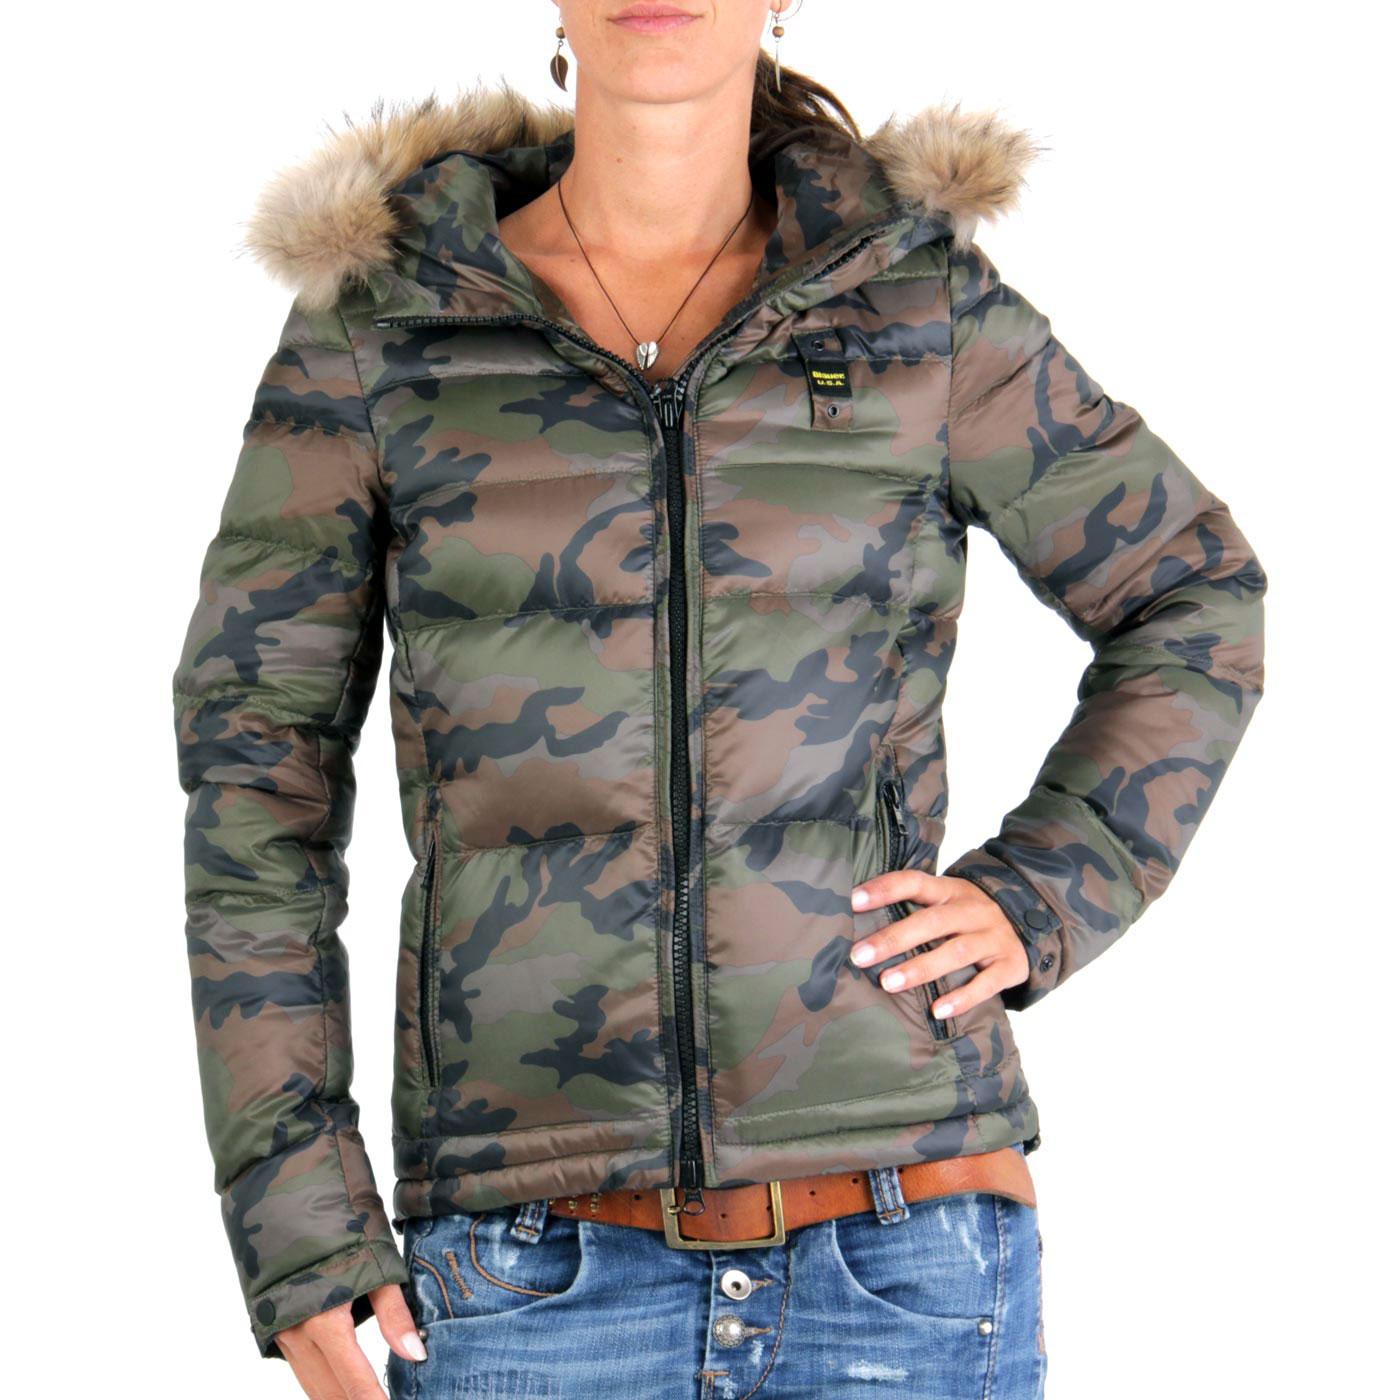 blauer usa damen winter daunenjacke army camouflage 0675. Black Bedroom Furniture Sets. Home Design Ideas